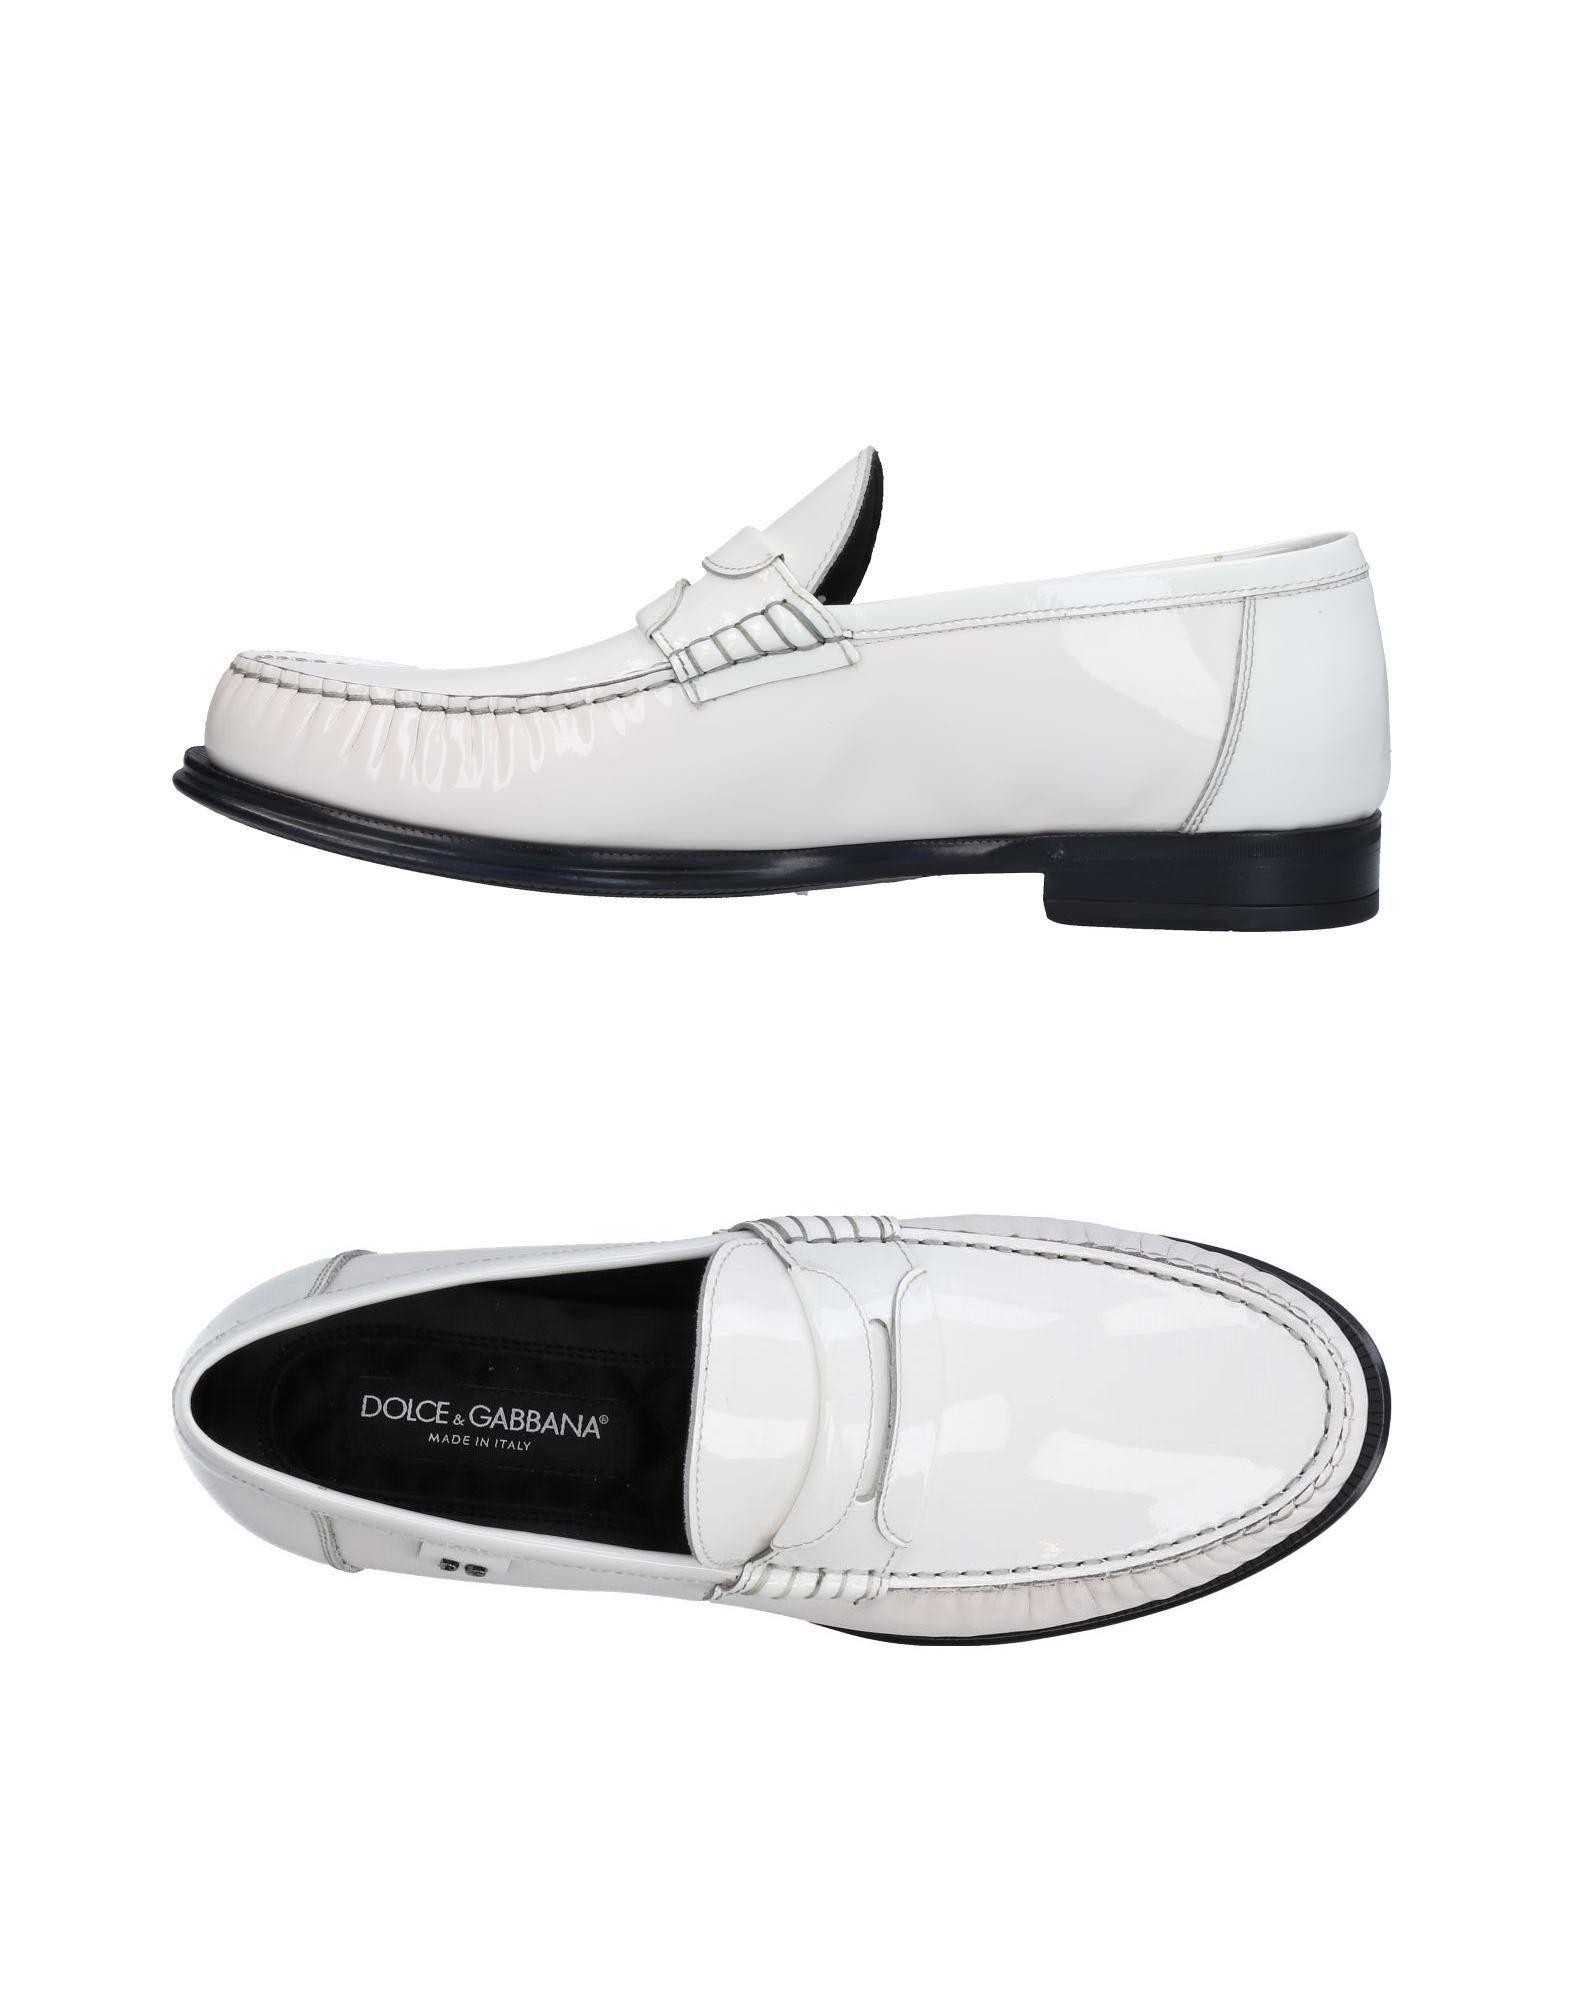 Dolce & Gabbana Mokassins Herren  11421824OX Gute Qualität beliebte Schuhe